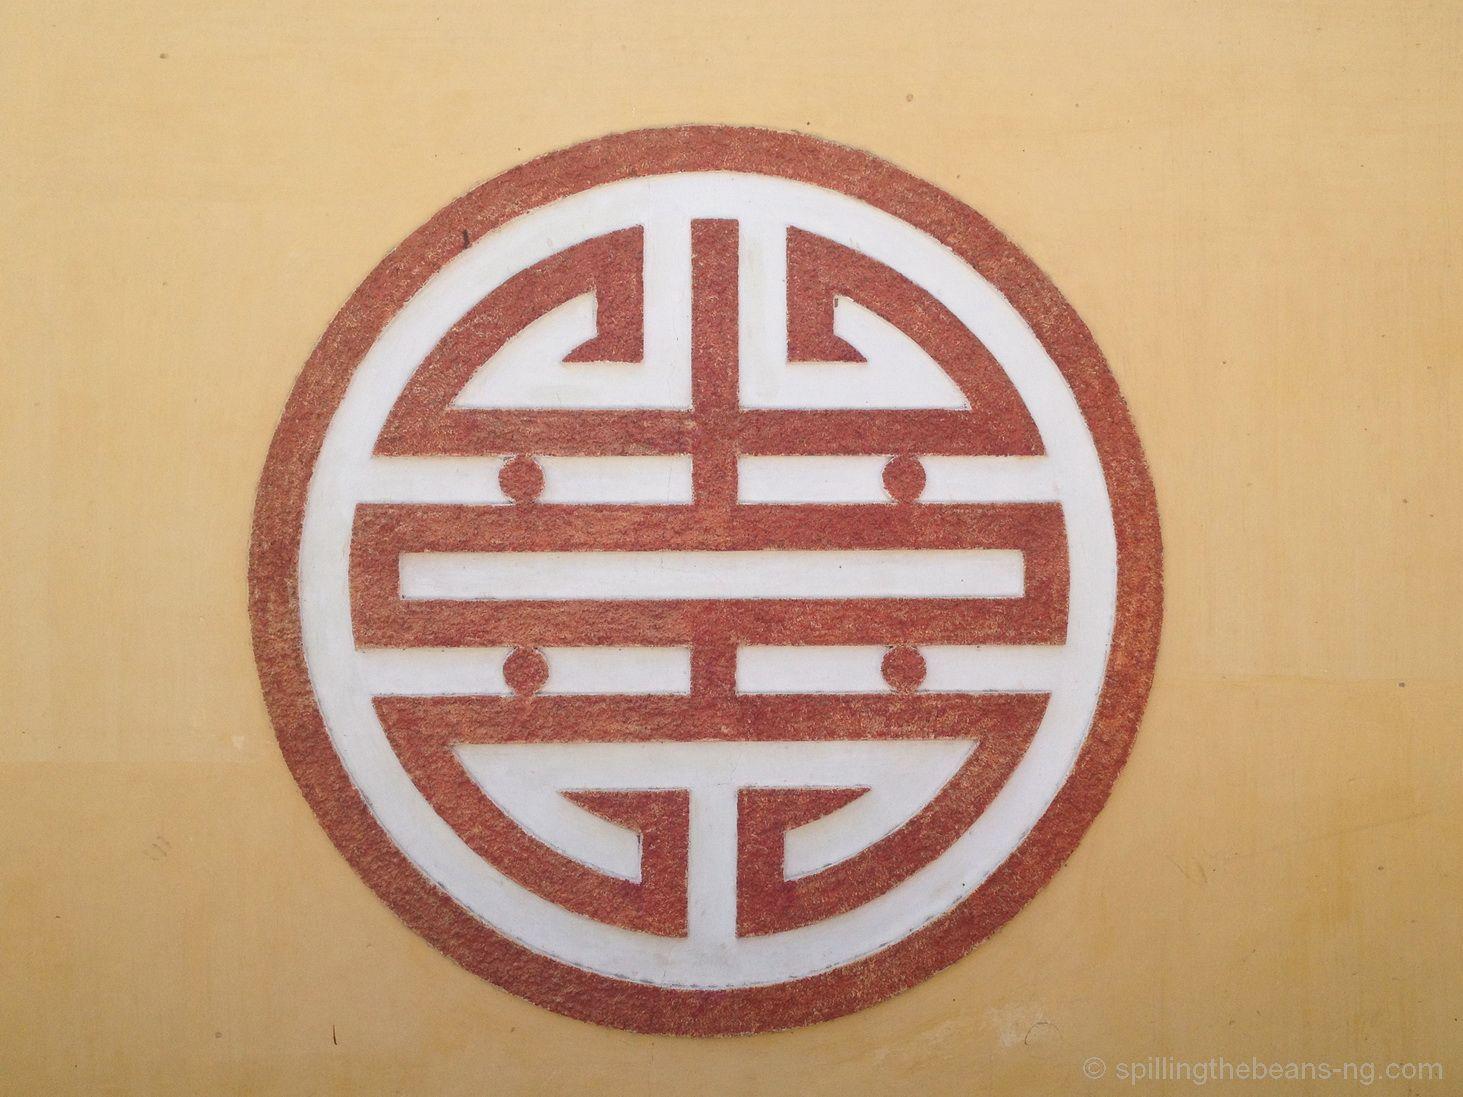 Vietnamese happiness symbol vietnam pinterest symbols vietnamese happiness symbol vietnam pinterest symbols tattoo and tatoo buycottarizona